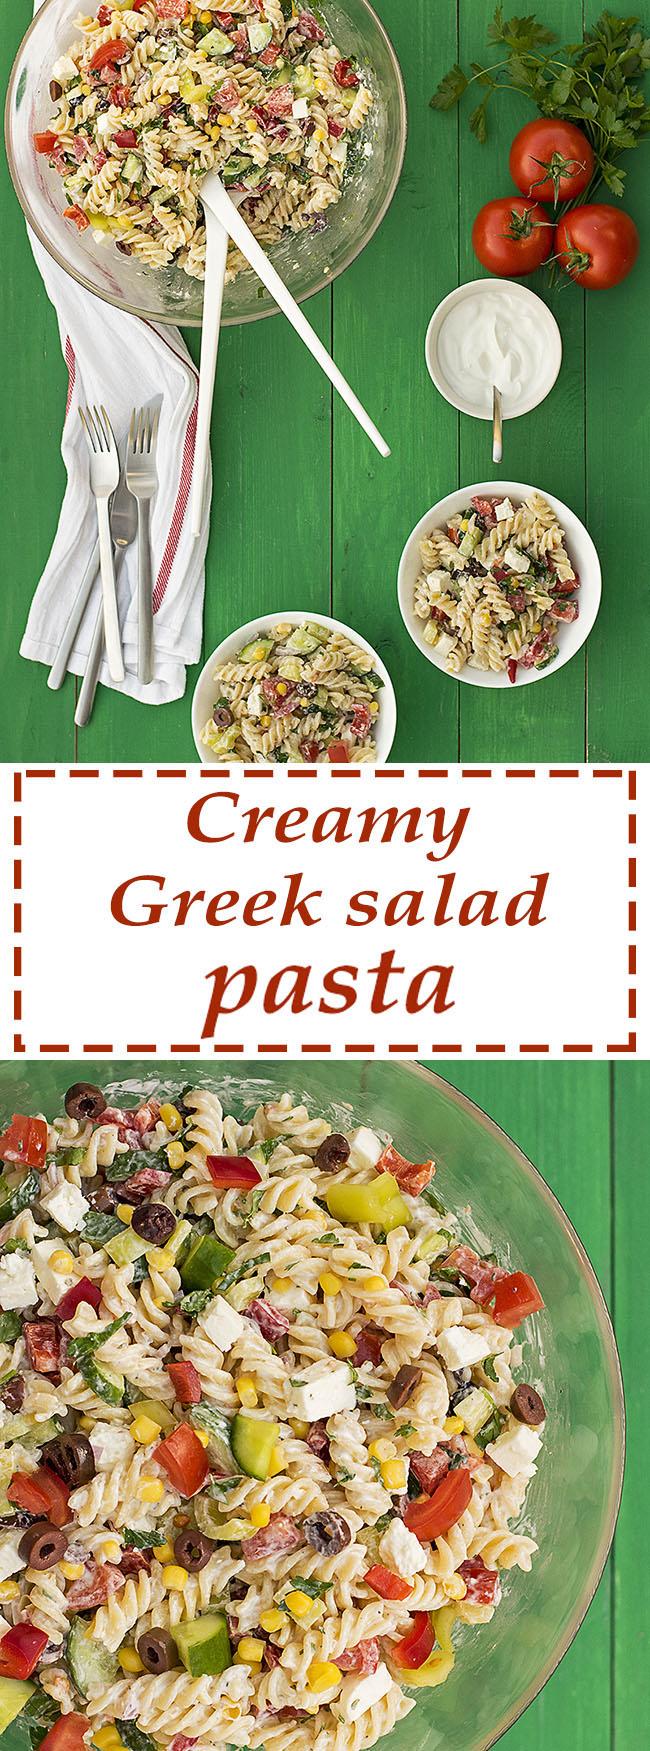 Creamy Greek salad pasta recipe 6